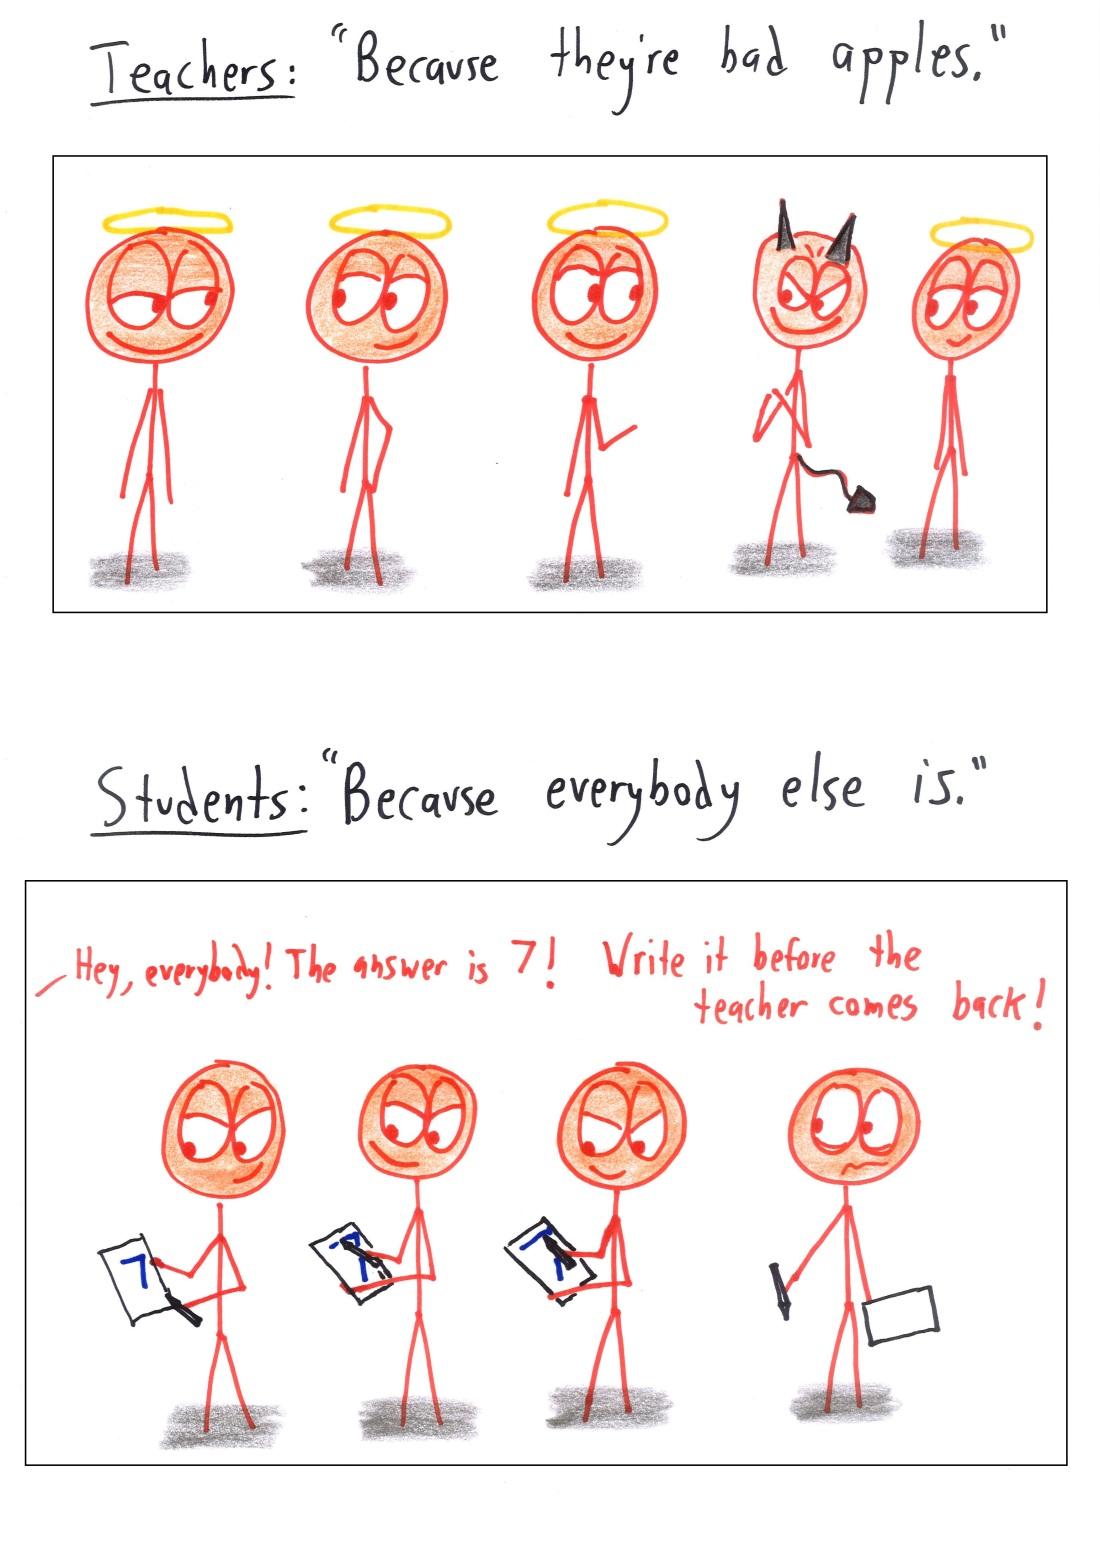 Why should we study math